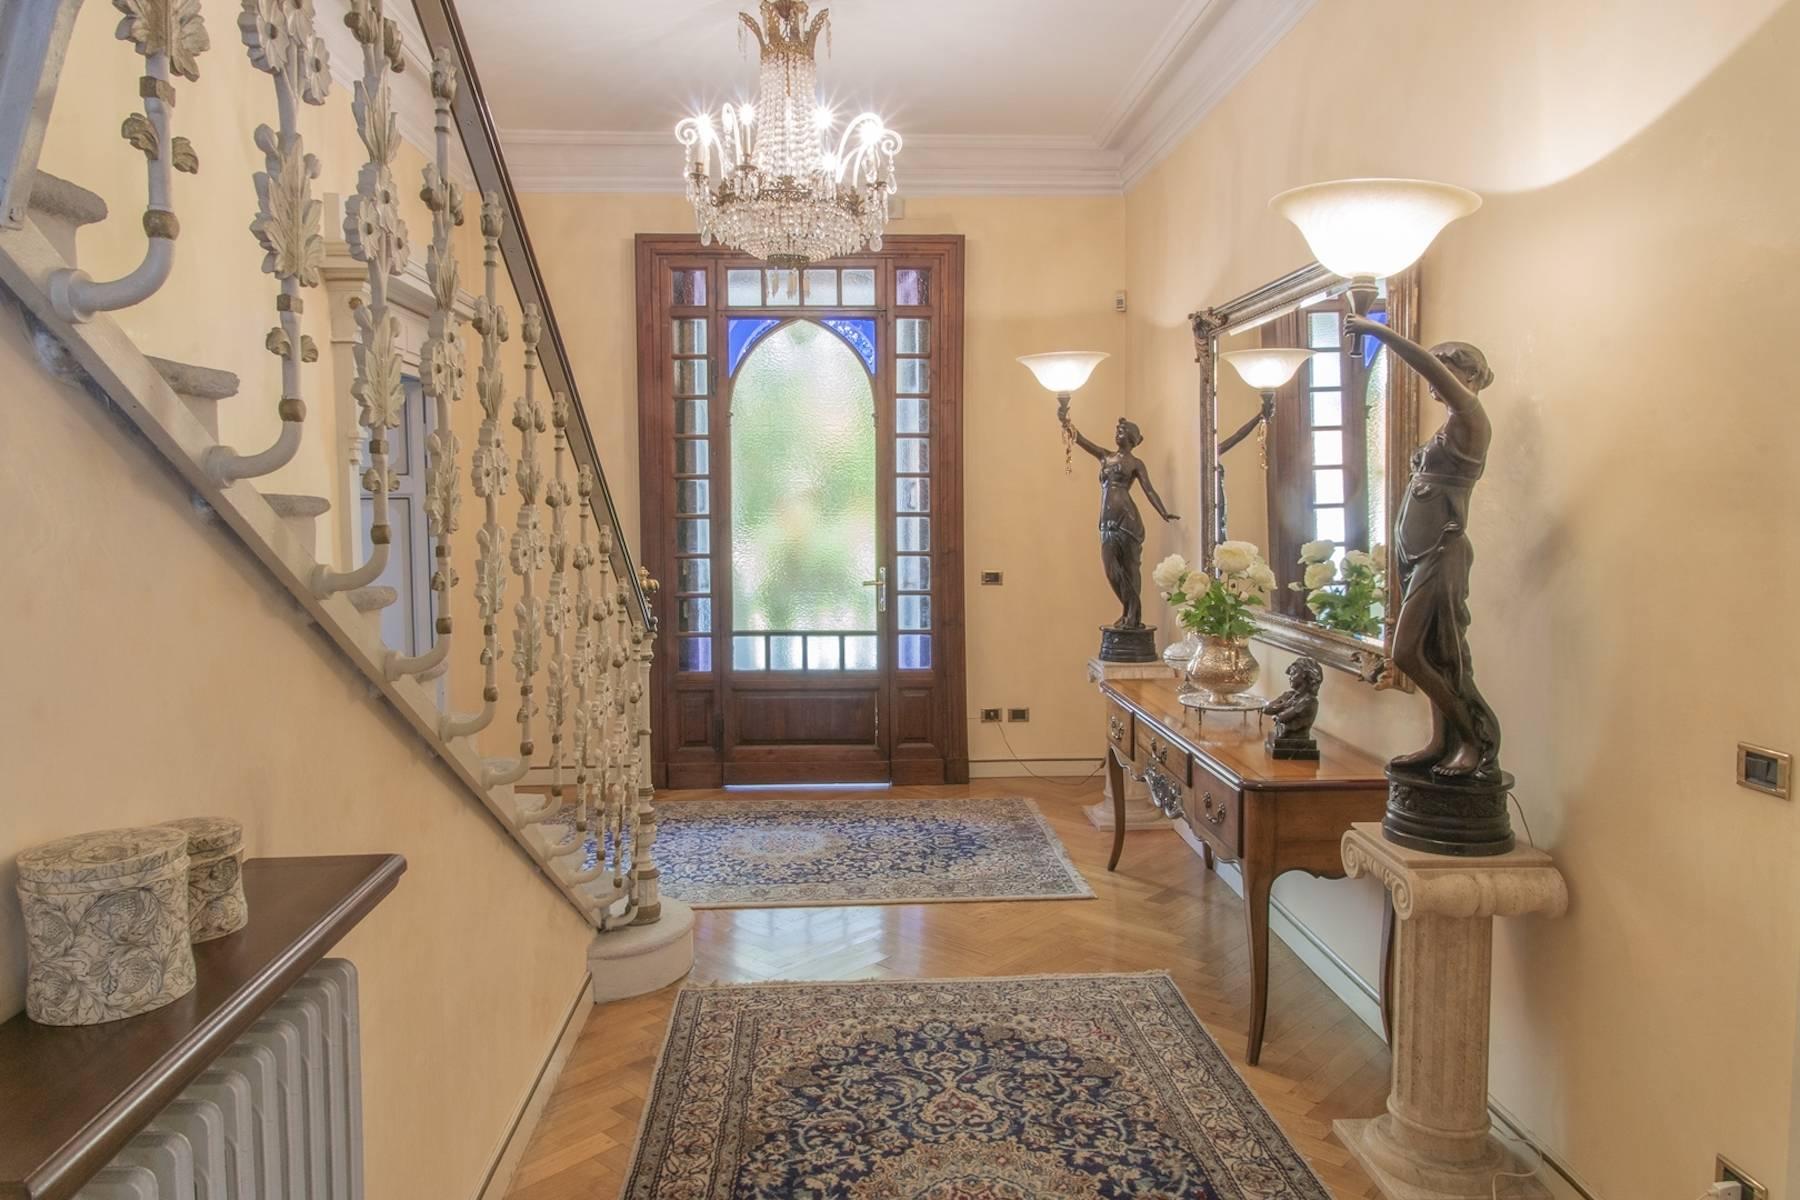 Villa in Vendita a Stresa: 5 locali, 700 mq - Foto 12